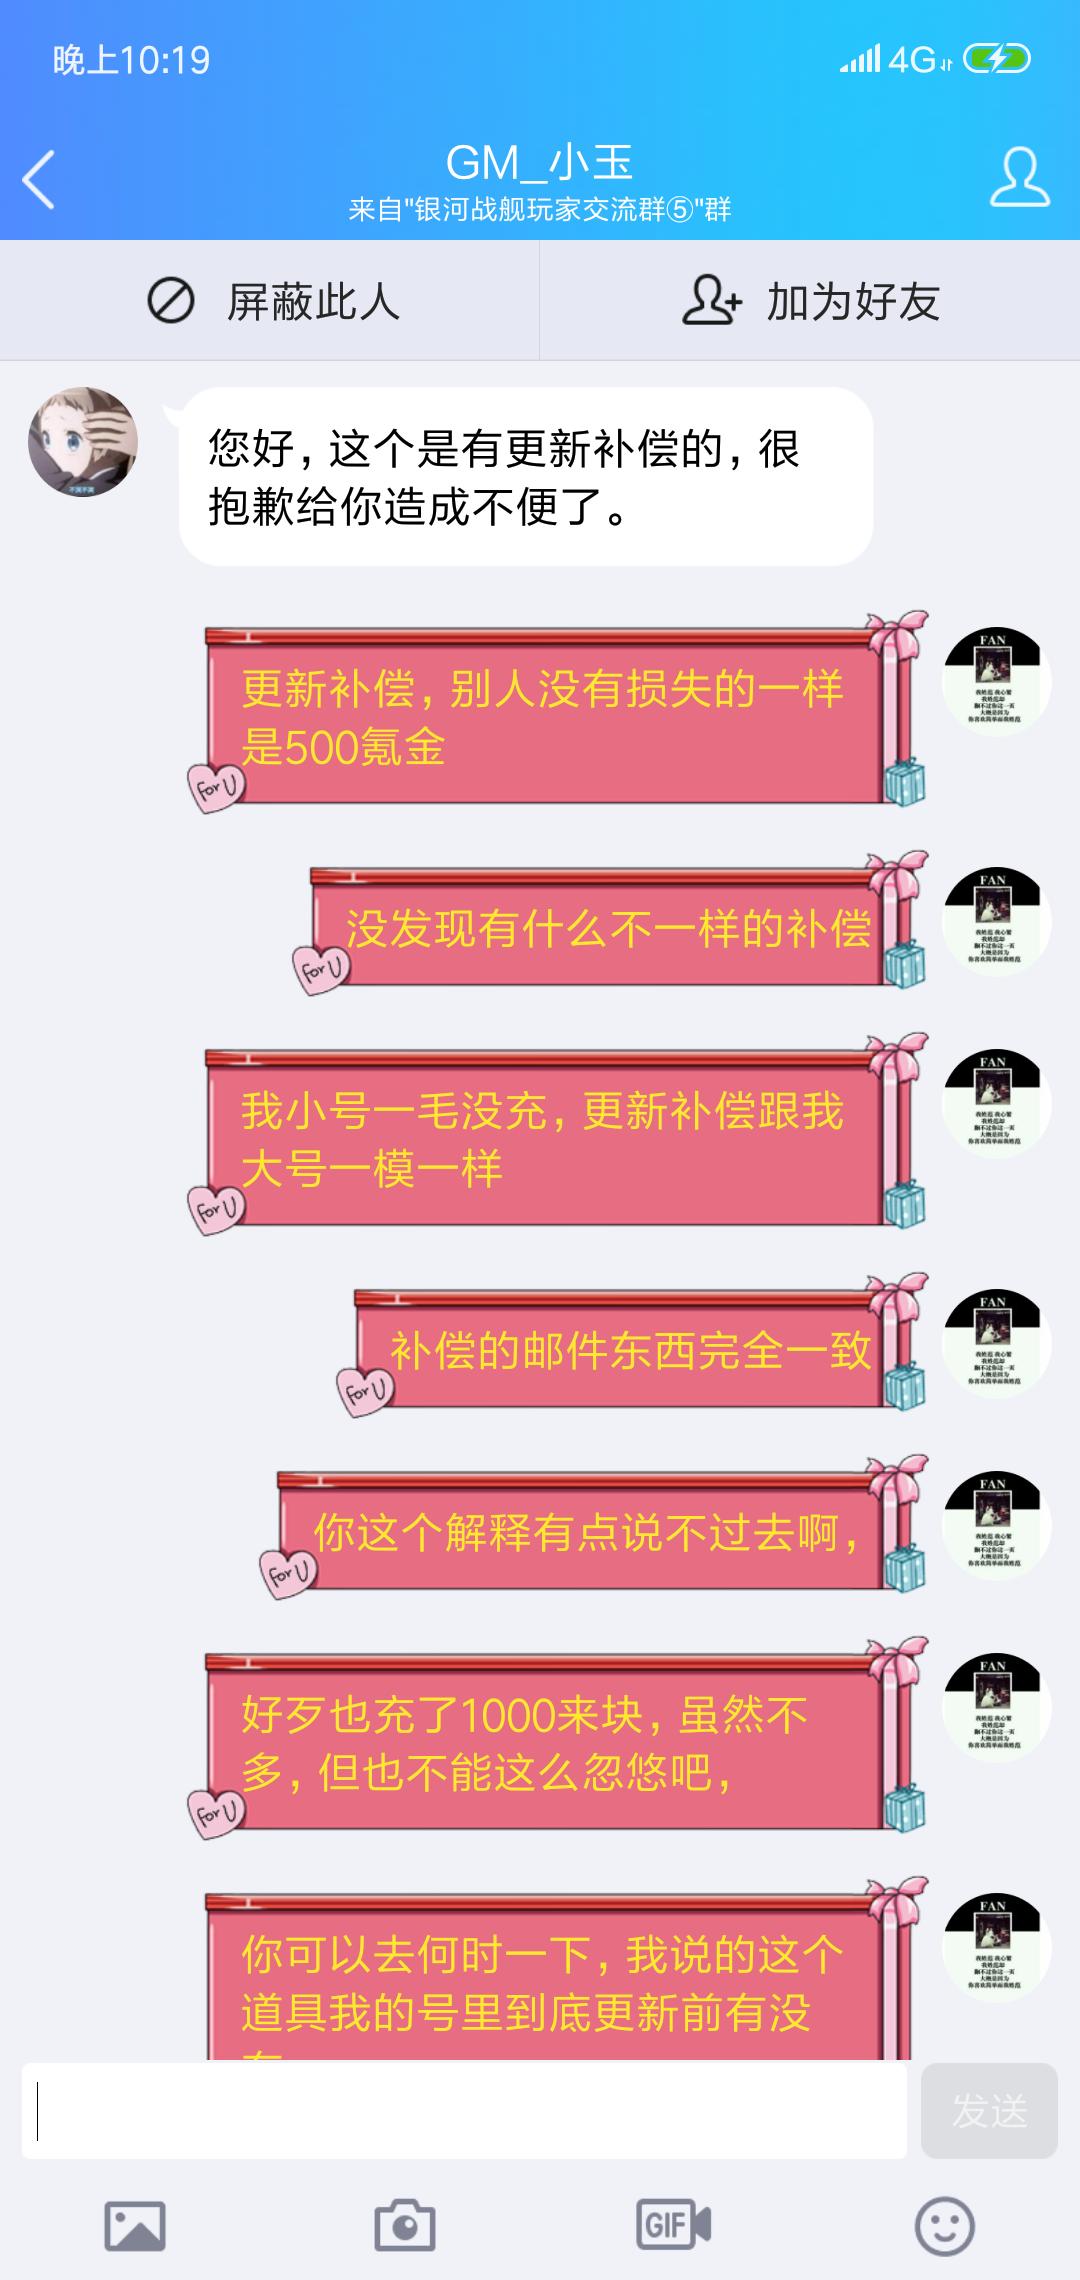 Screenshot_2019-03-28-22-19-32-273_com.tencent.mobileqq.png